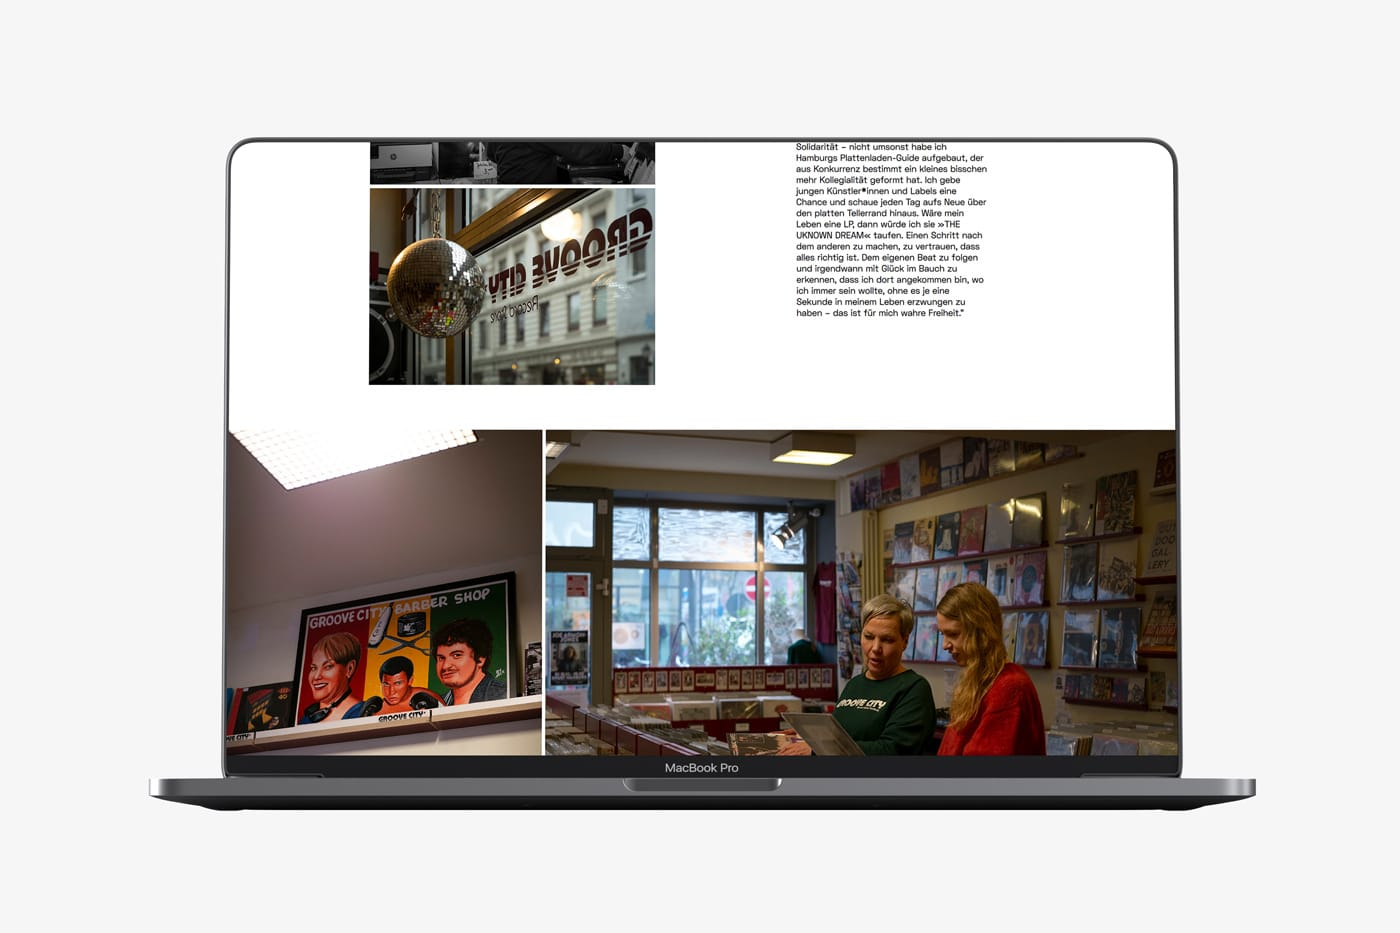 Screendesign Marga Glanz, Portresie de femme